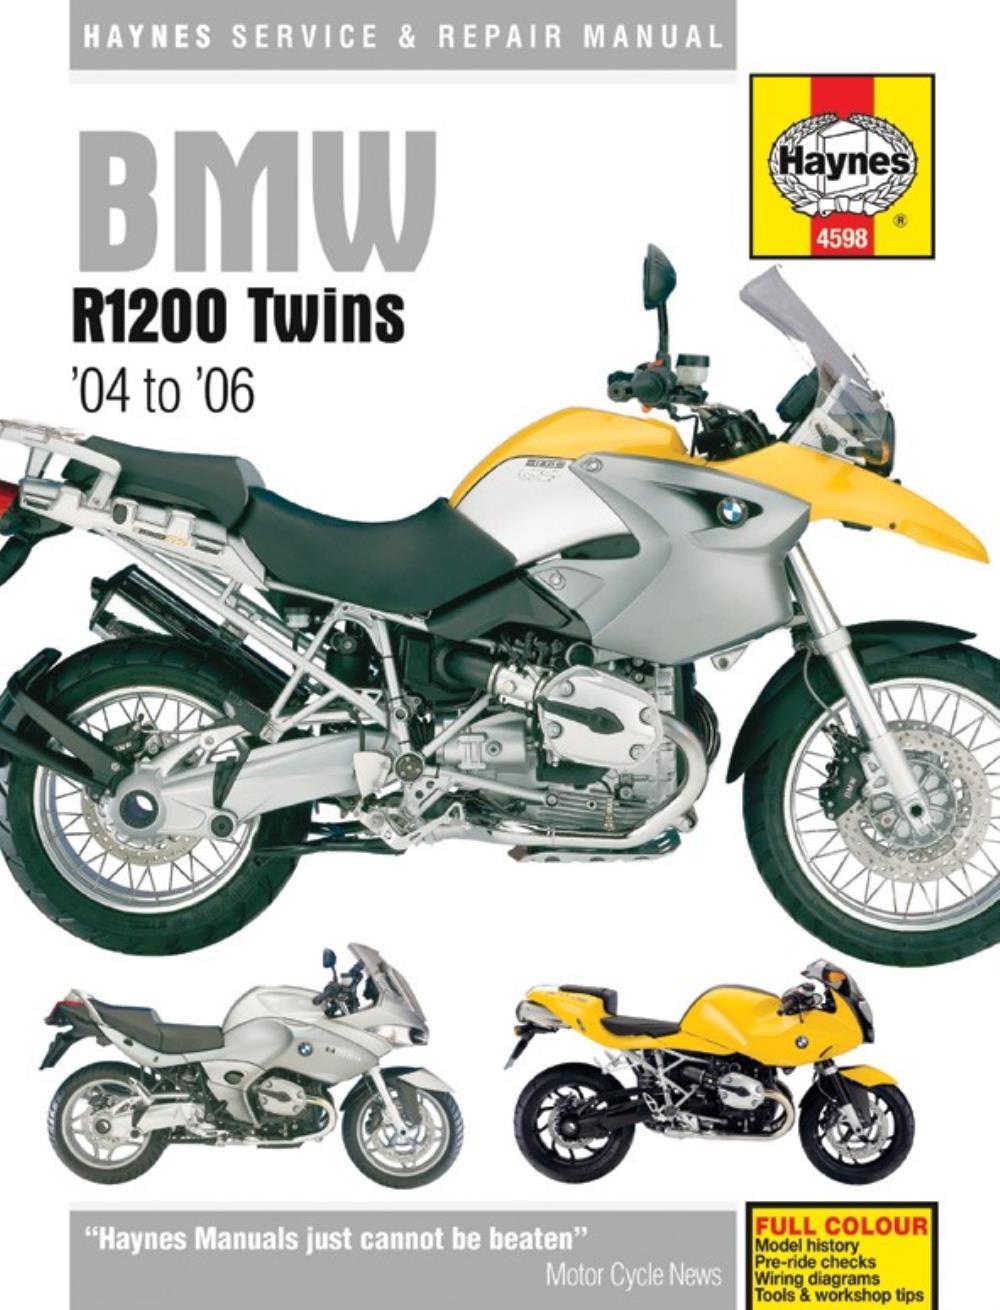 BMW R 1200 GS Spoked wheel 2004 Haynes Service Repair Manual 6281 ...